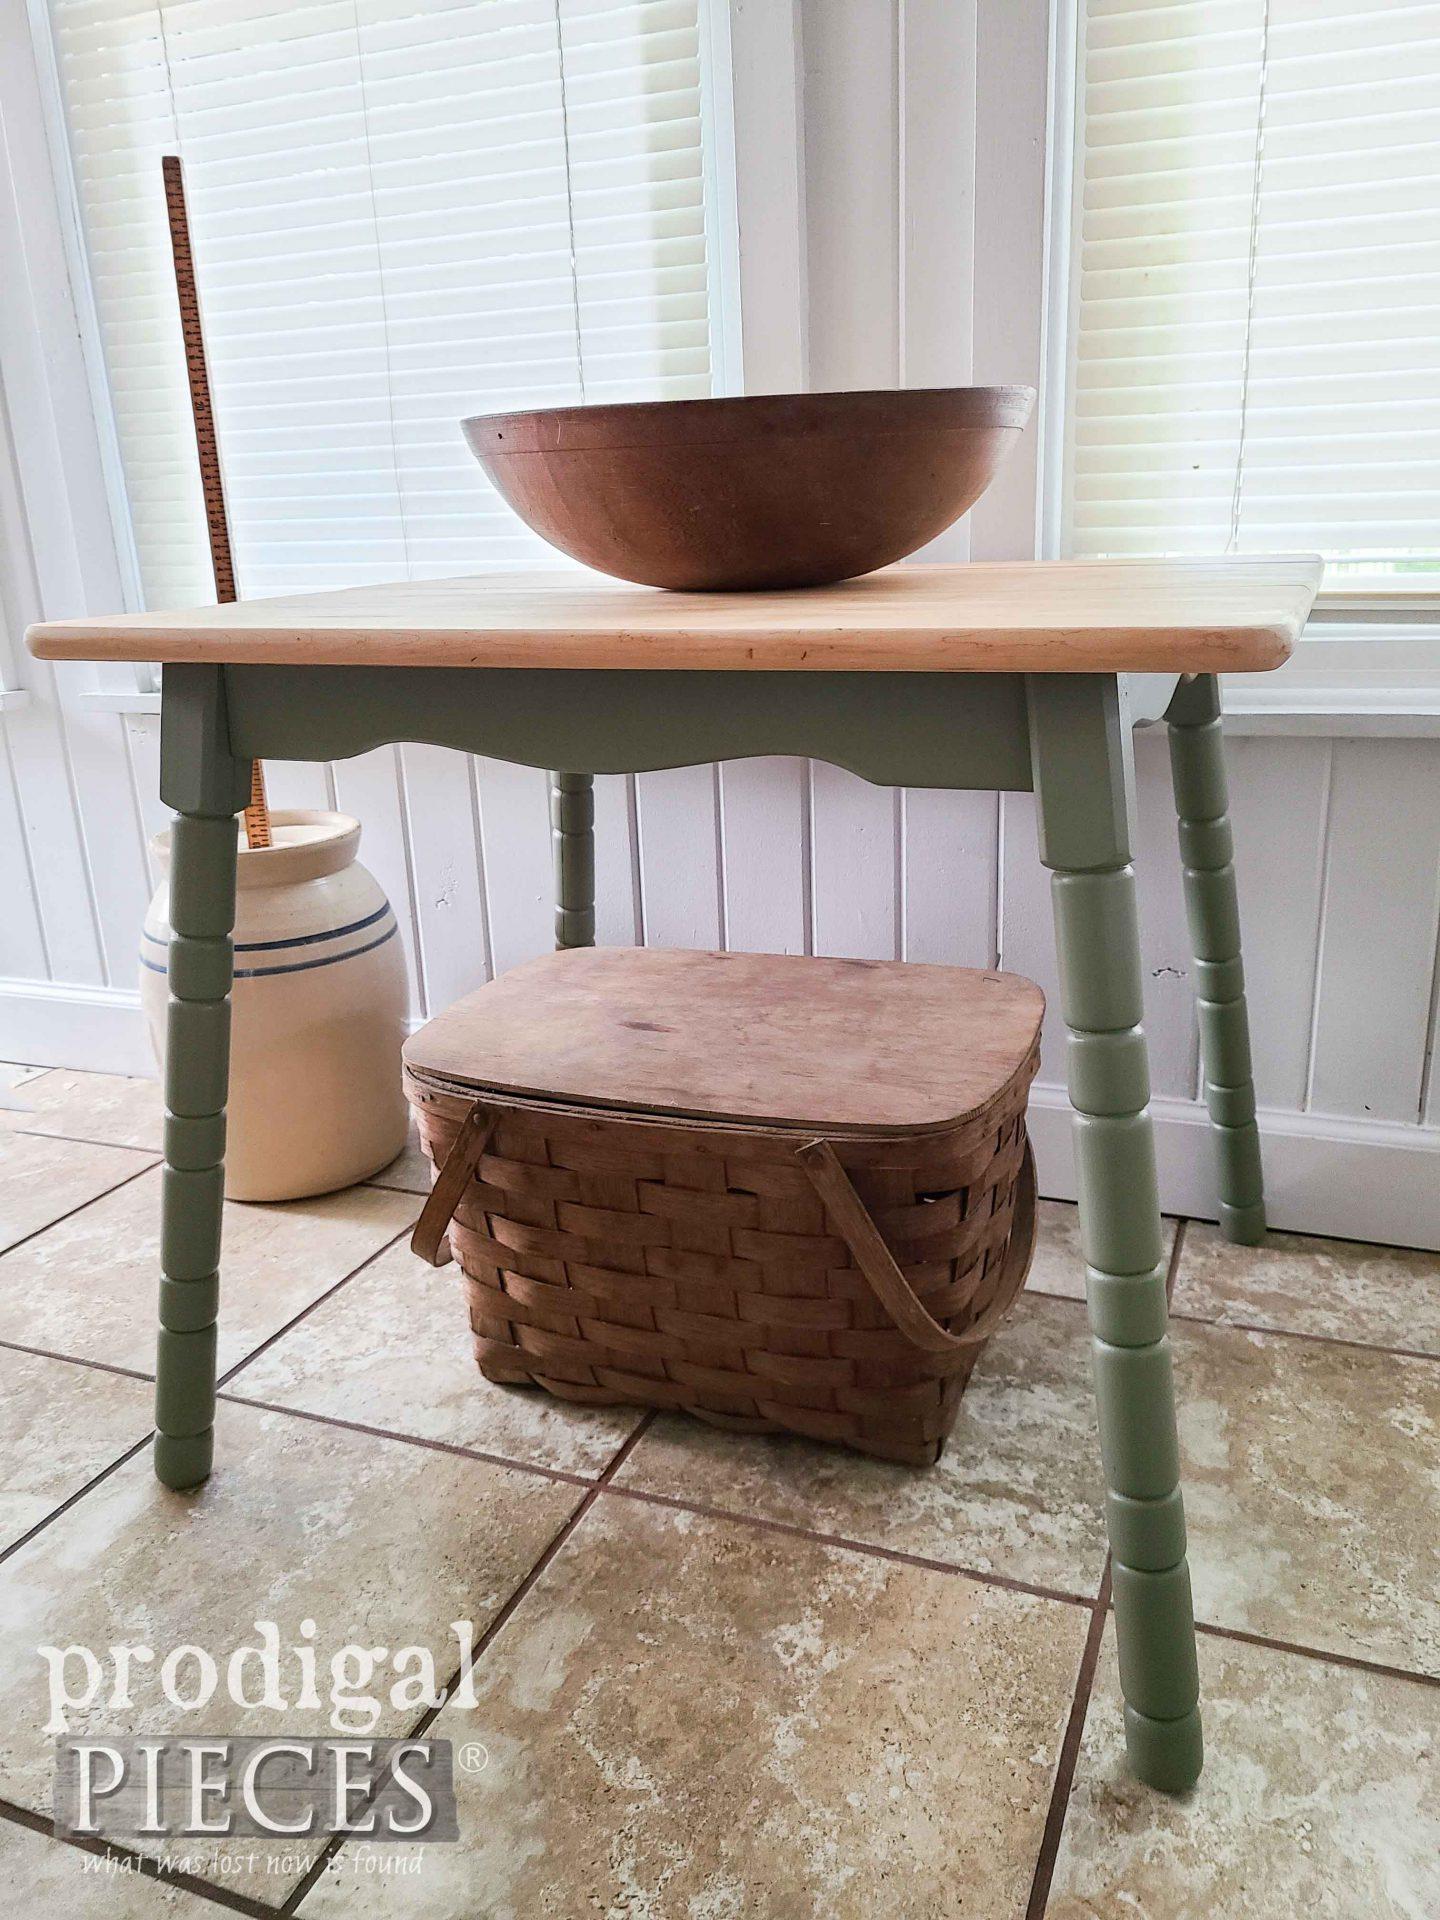 Turned Vintage Table Legs on Mini Farmhouse Table by Prodigal Pieces   prodigalpieces.com #prodigalpieces #farmhouse #diy #home #homedecor